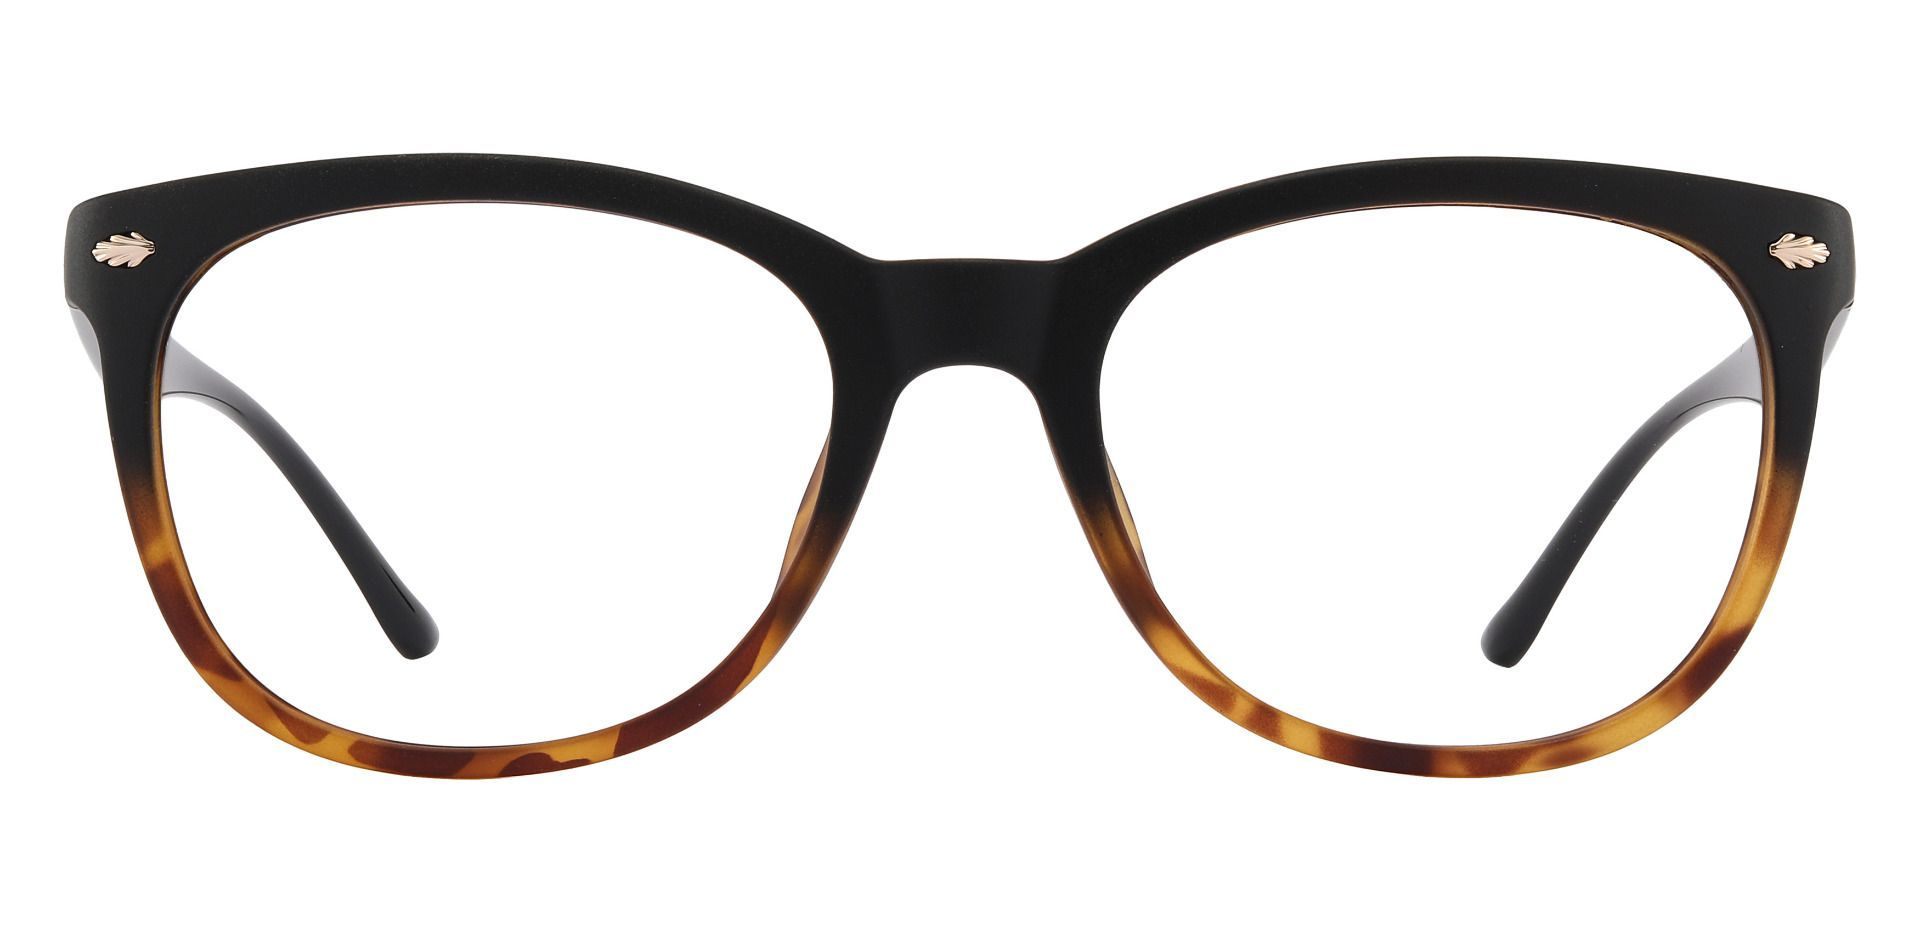 Pavilion Square Prescription Glasses - Black